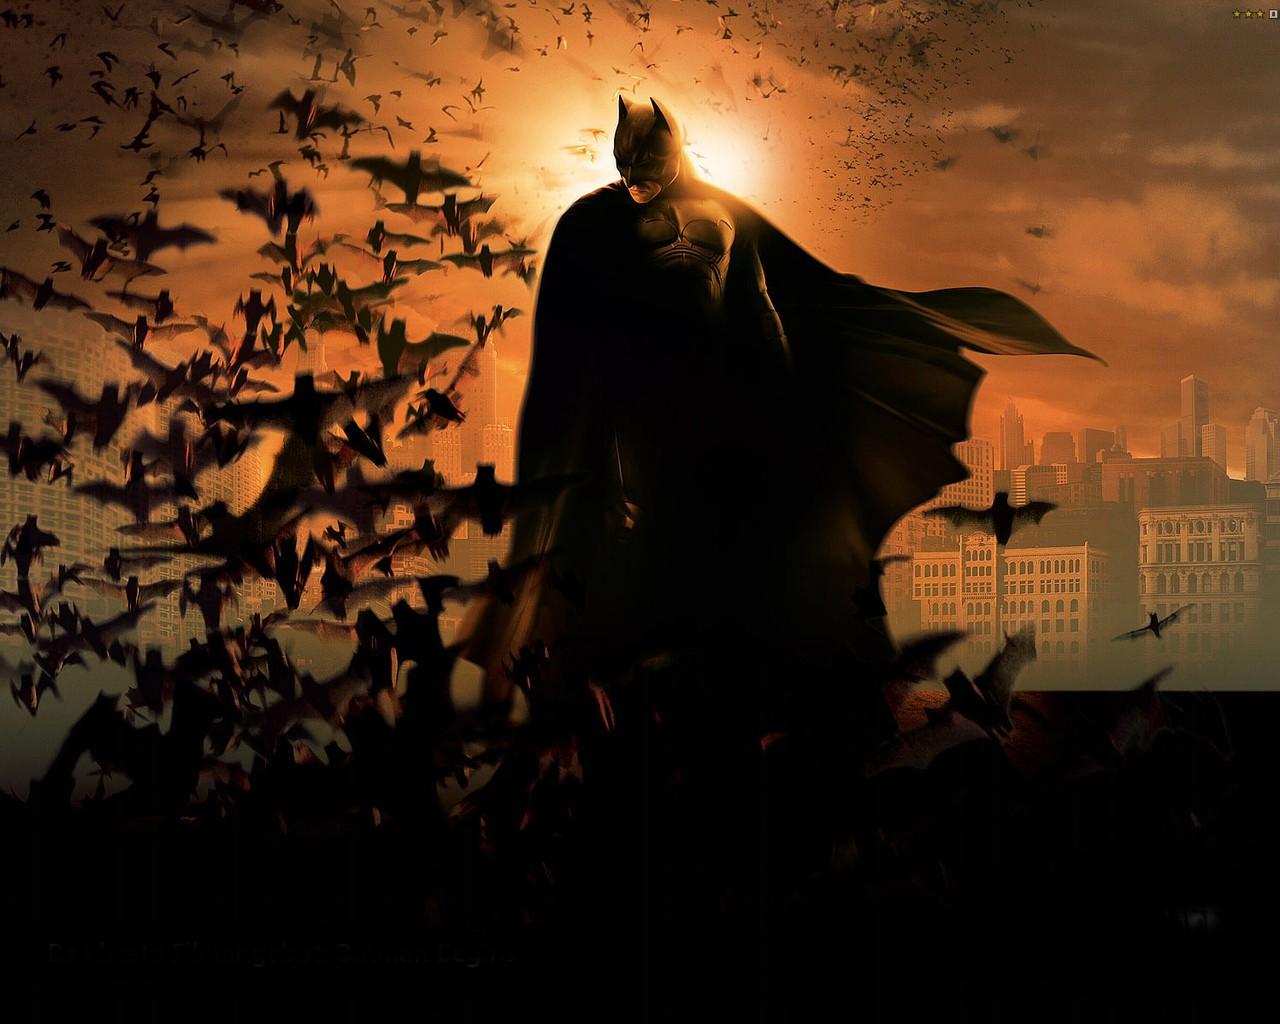 Download Batman Movies Wallpaper 1280x1024 Wallpoper 366906 1280x1024